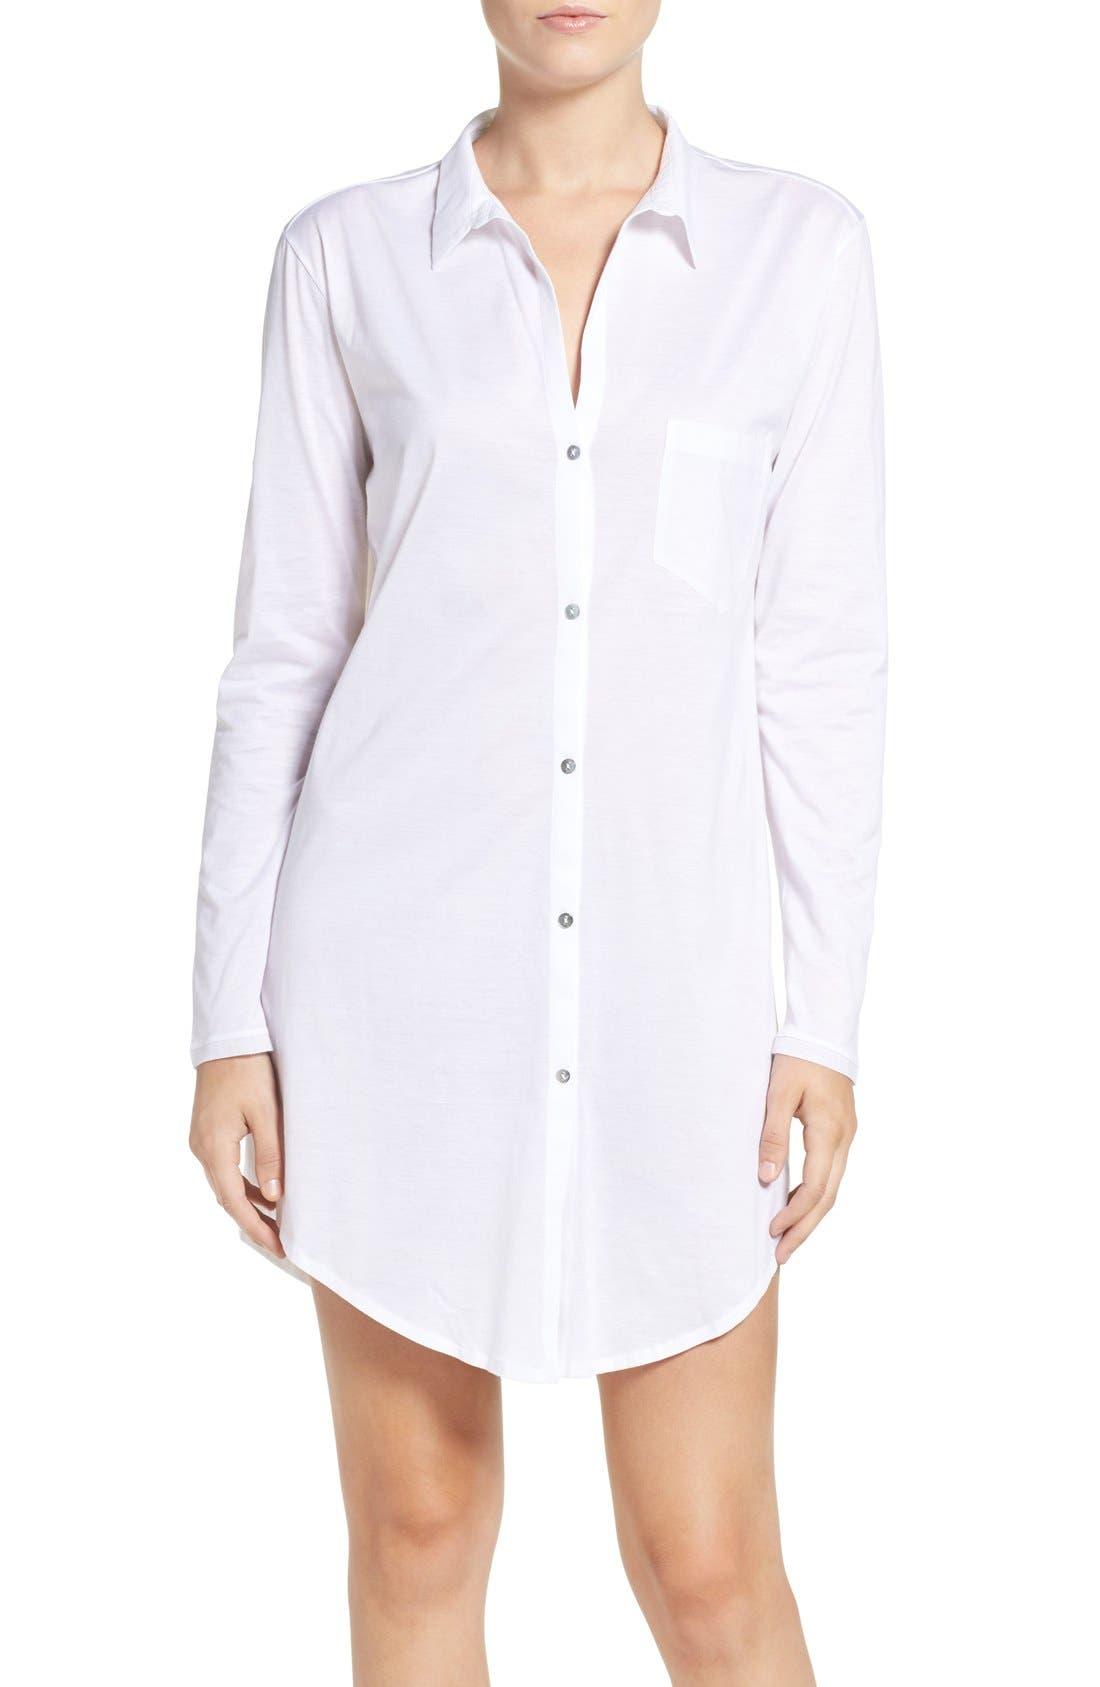 Hanro 'Deluxe Boyfriend' Jersey Sleep Shirt